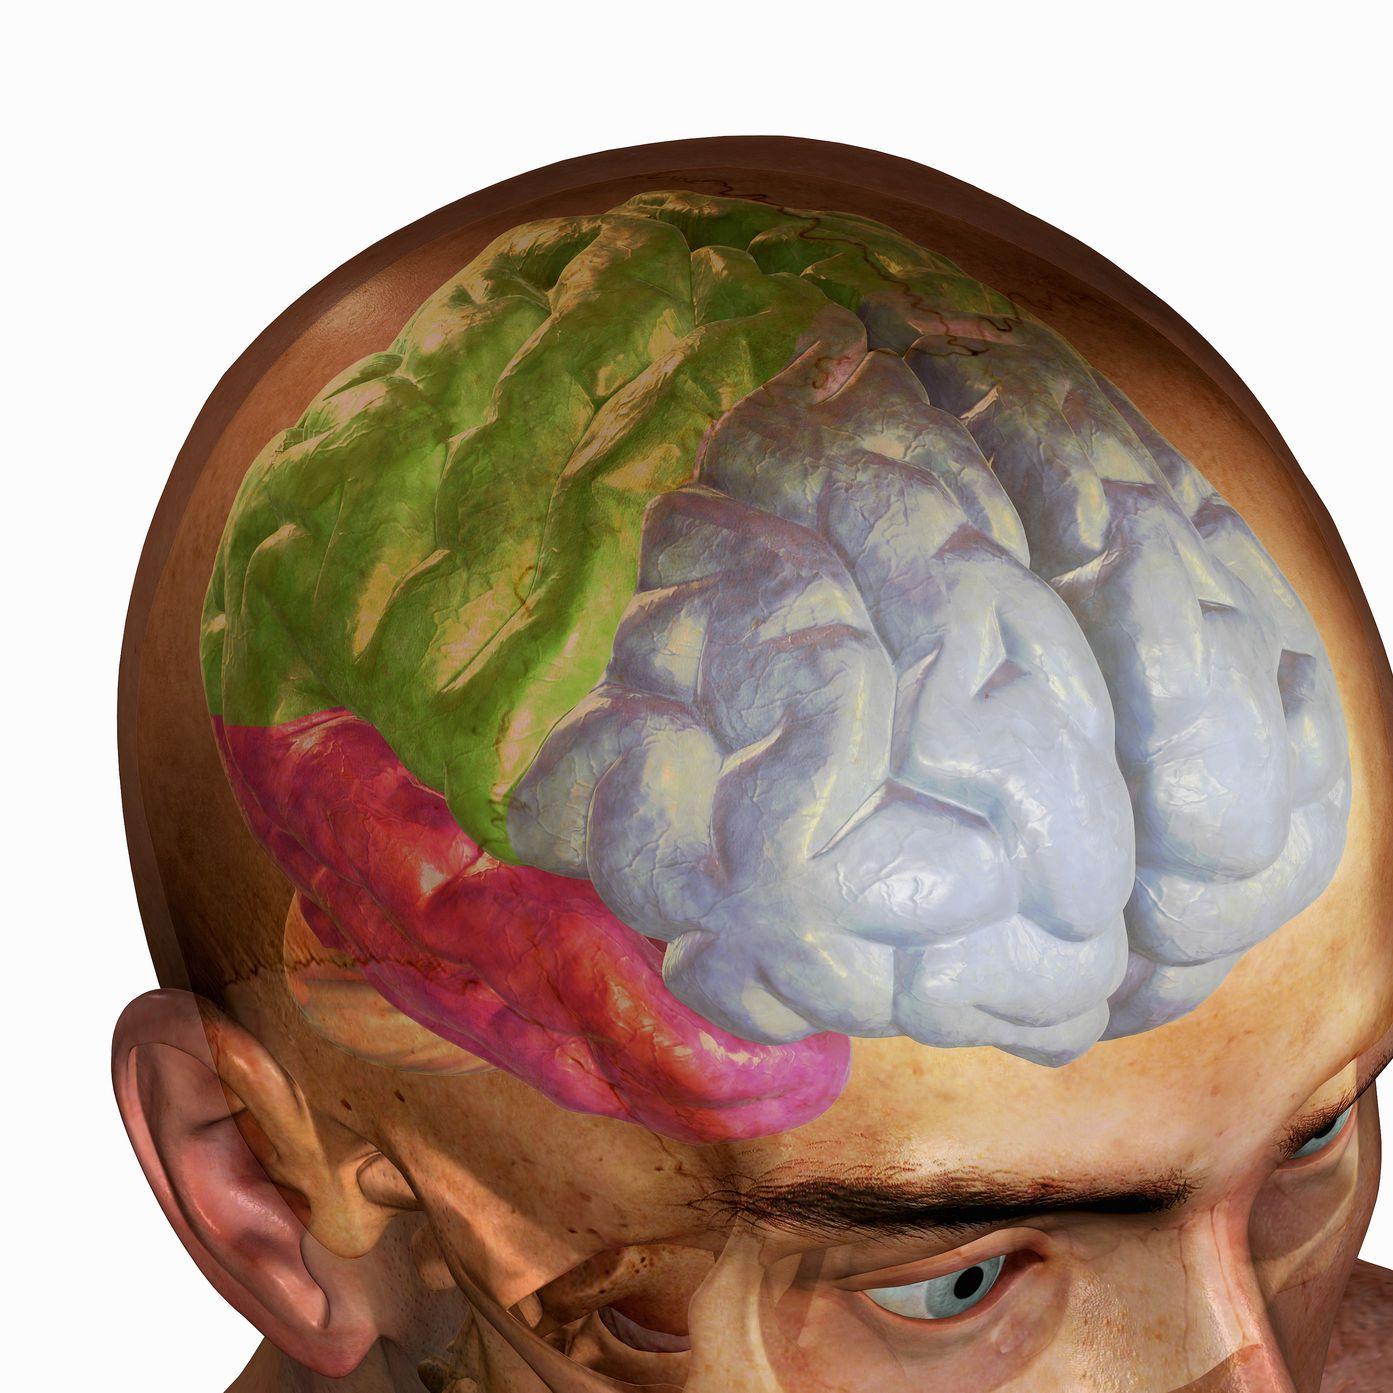 Frontal Lobe Head Trauma Effects and Treatment